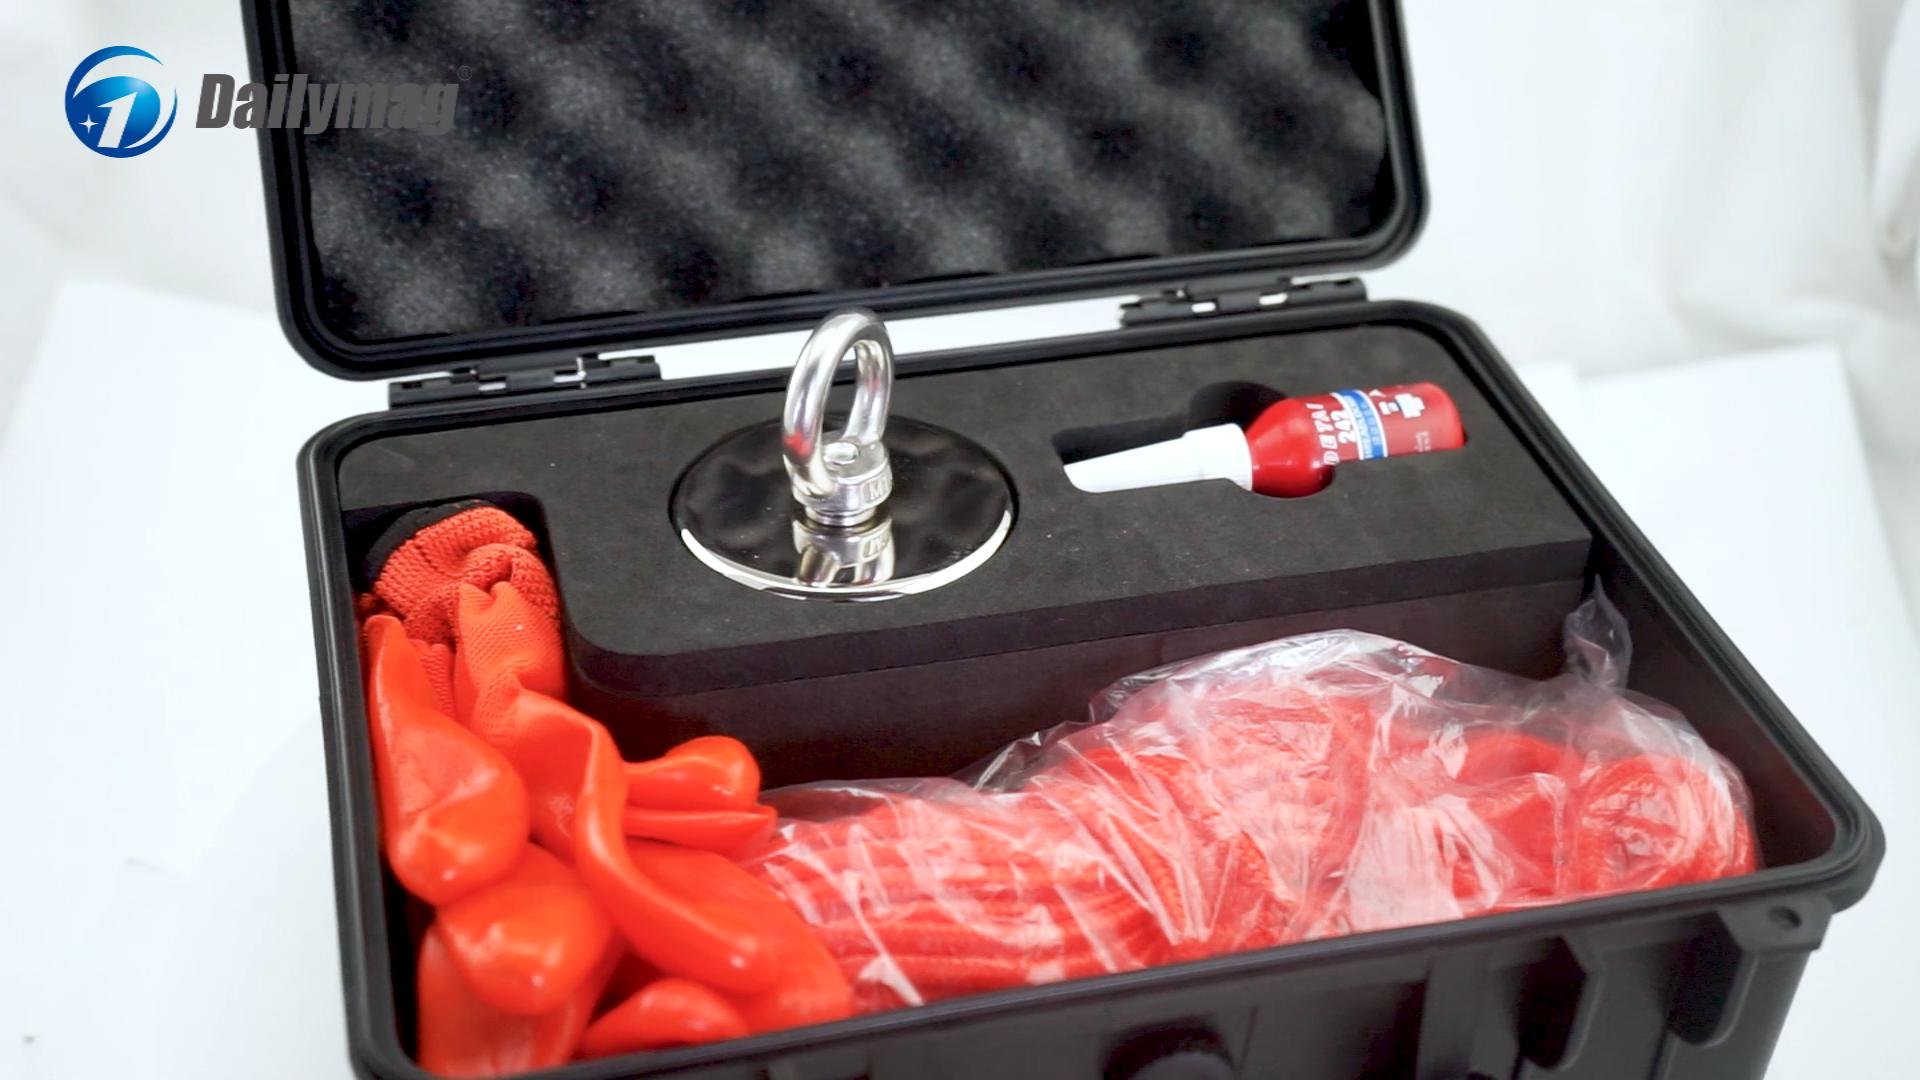 2020 Dailymag hot sale fishing magnet kit